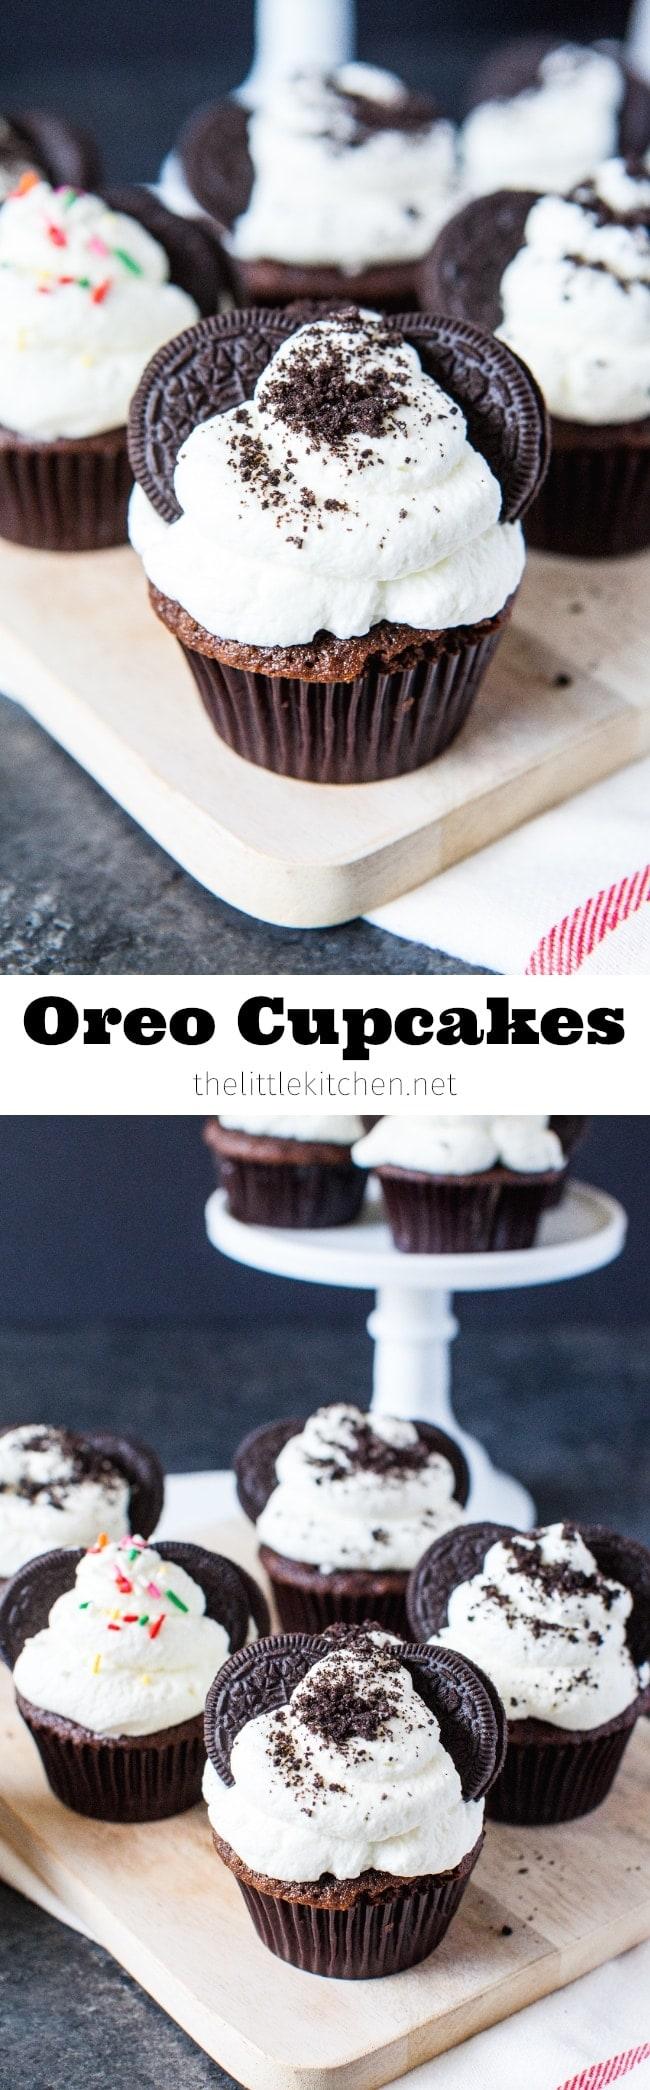 Oreo Cupcakes from thelittlekitchen.net